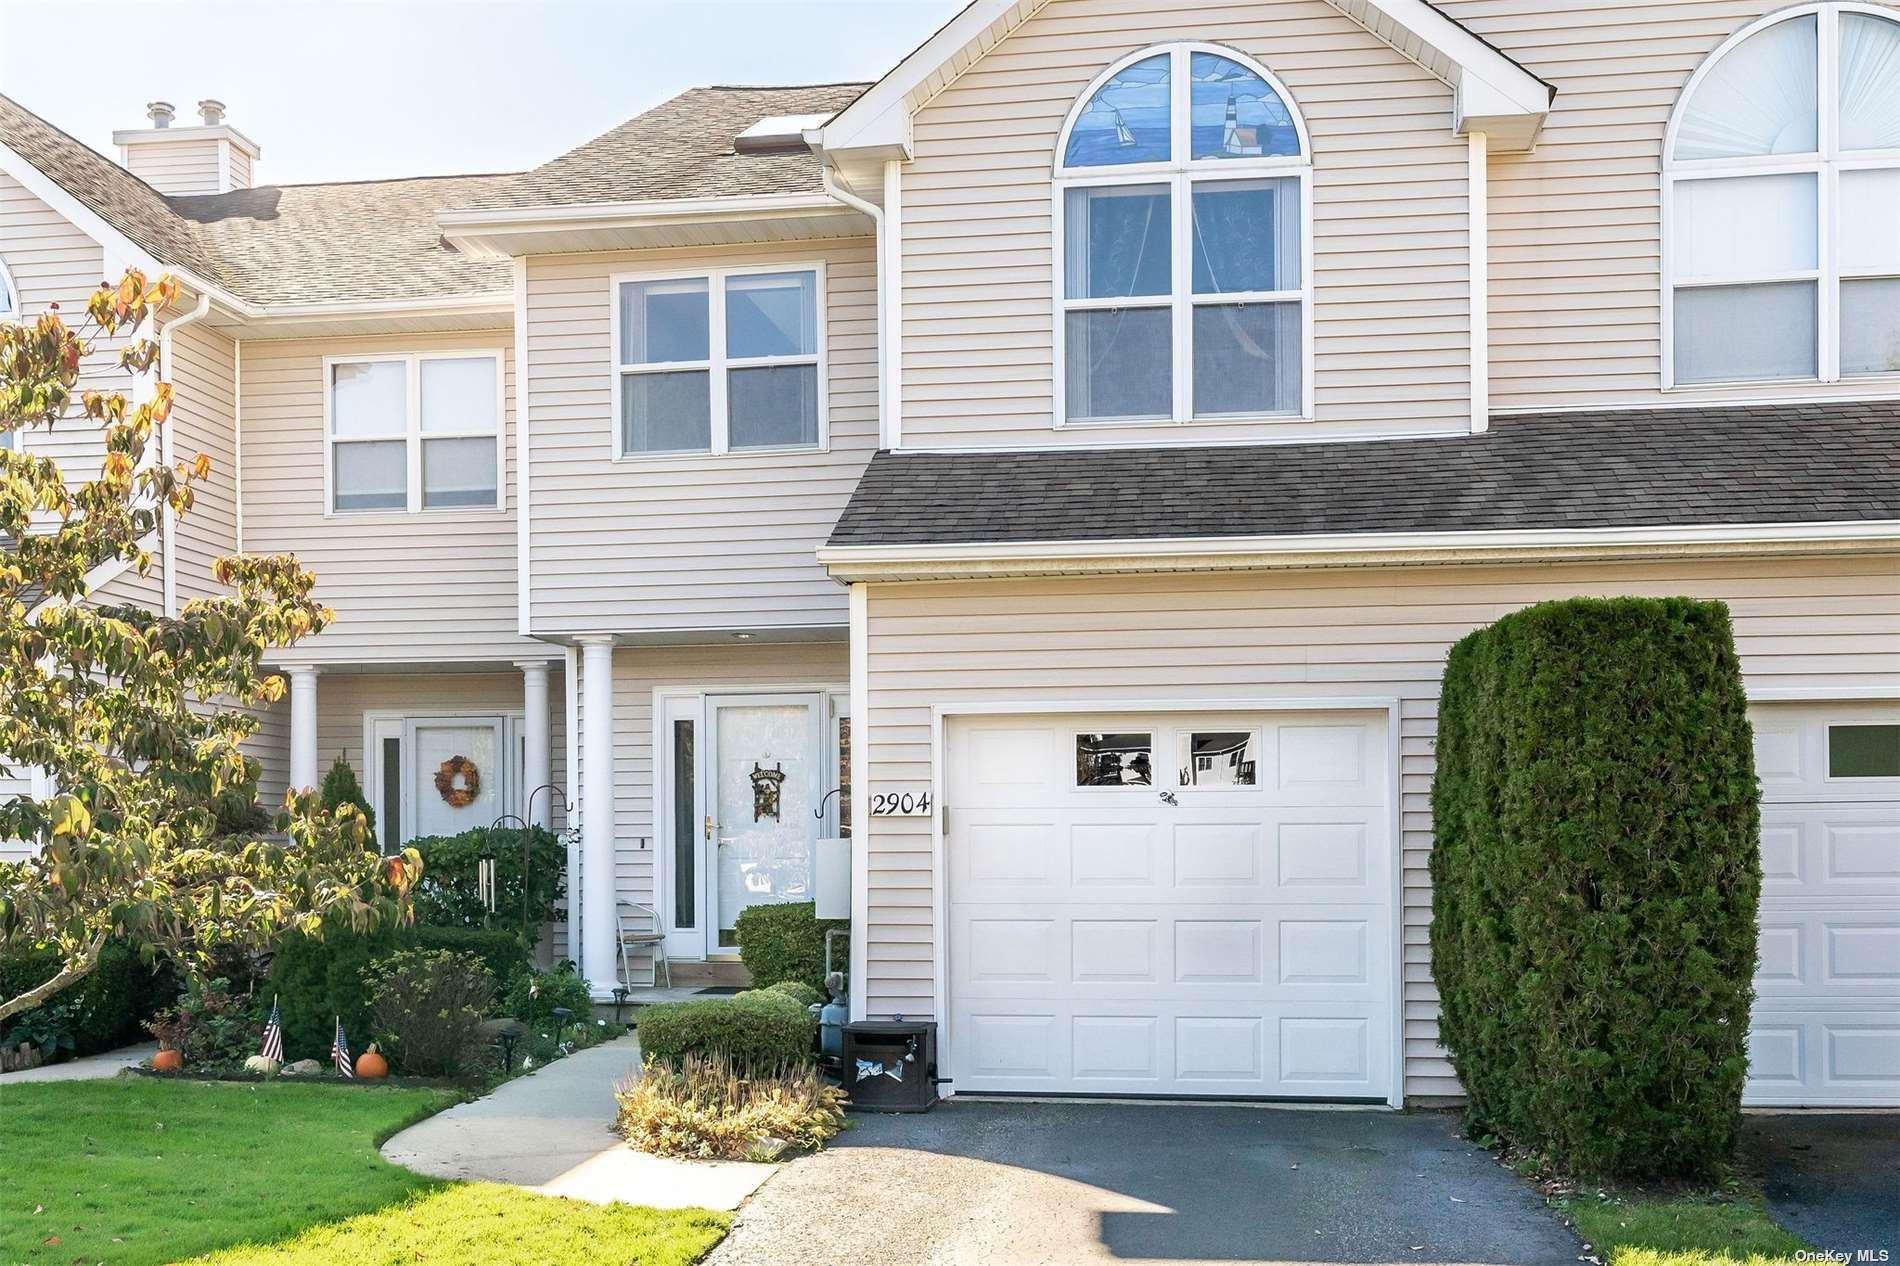 2904 Willow Pond Drive #2904, Riverhead, NY 11901 - MLS#: 3355449